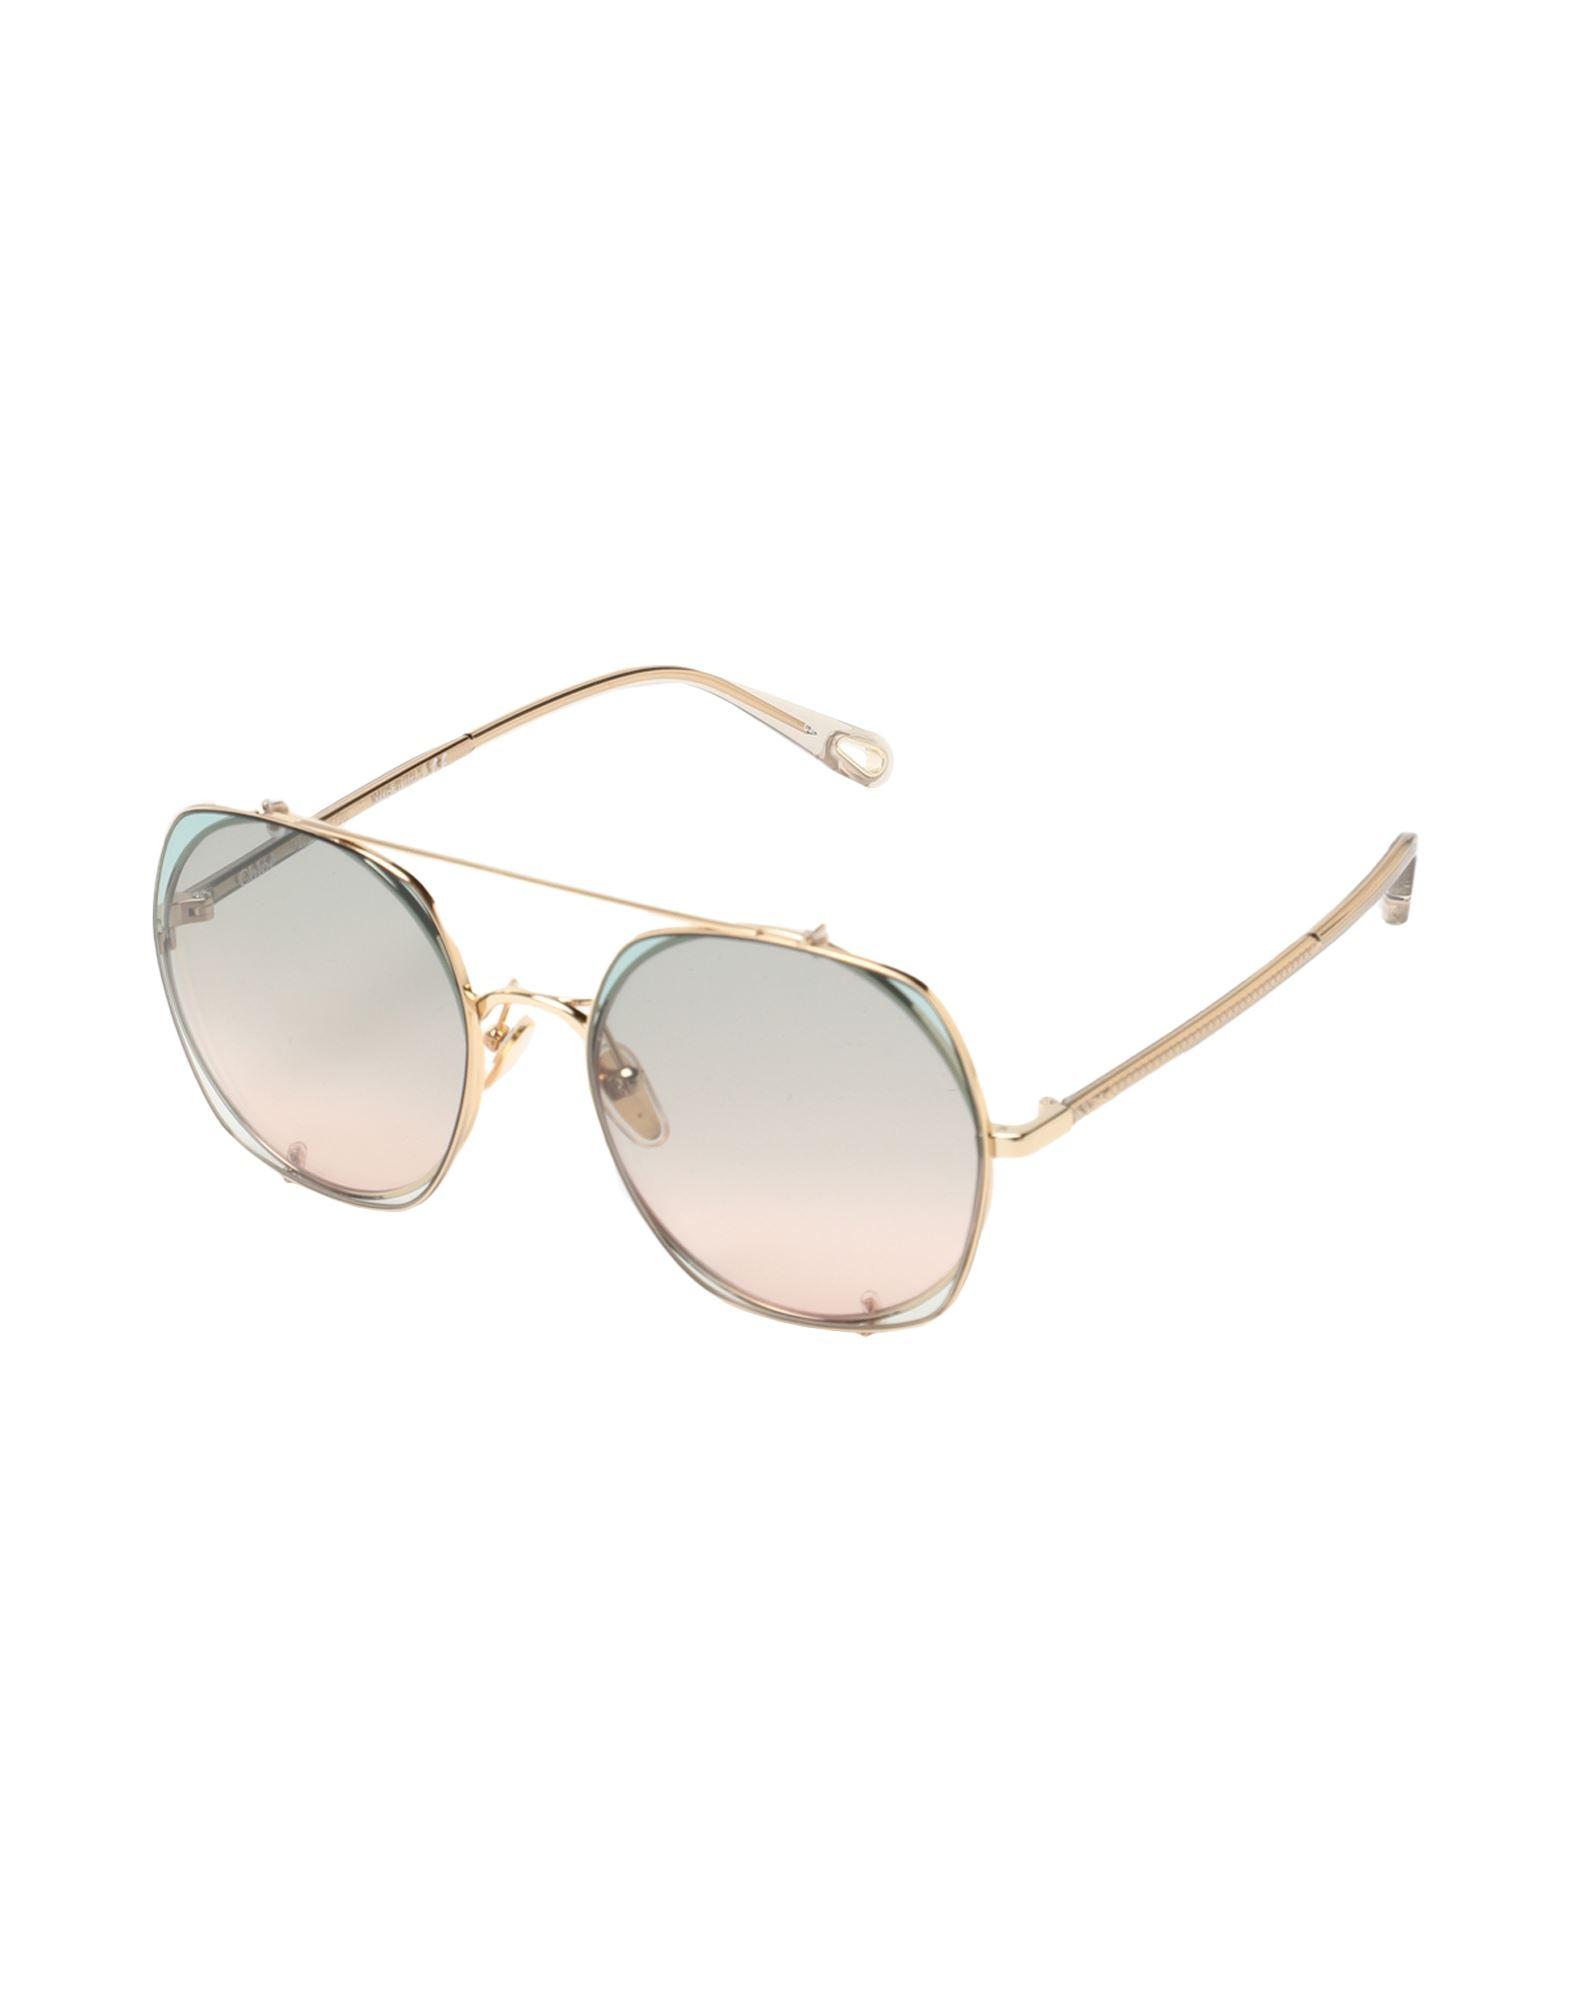 CHLOÉ Sunglasses - Item 46749721